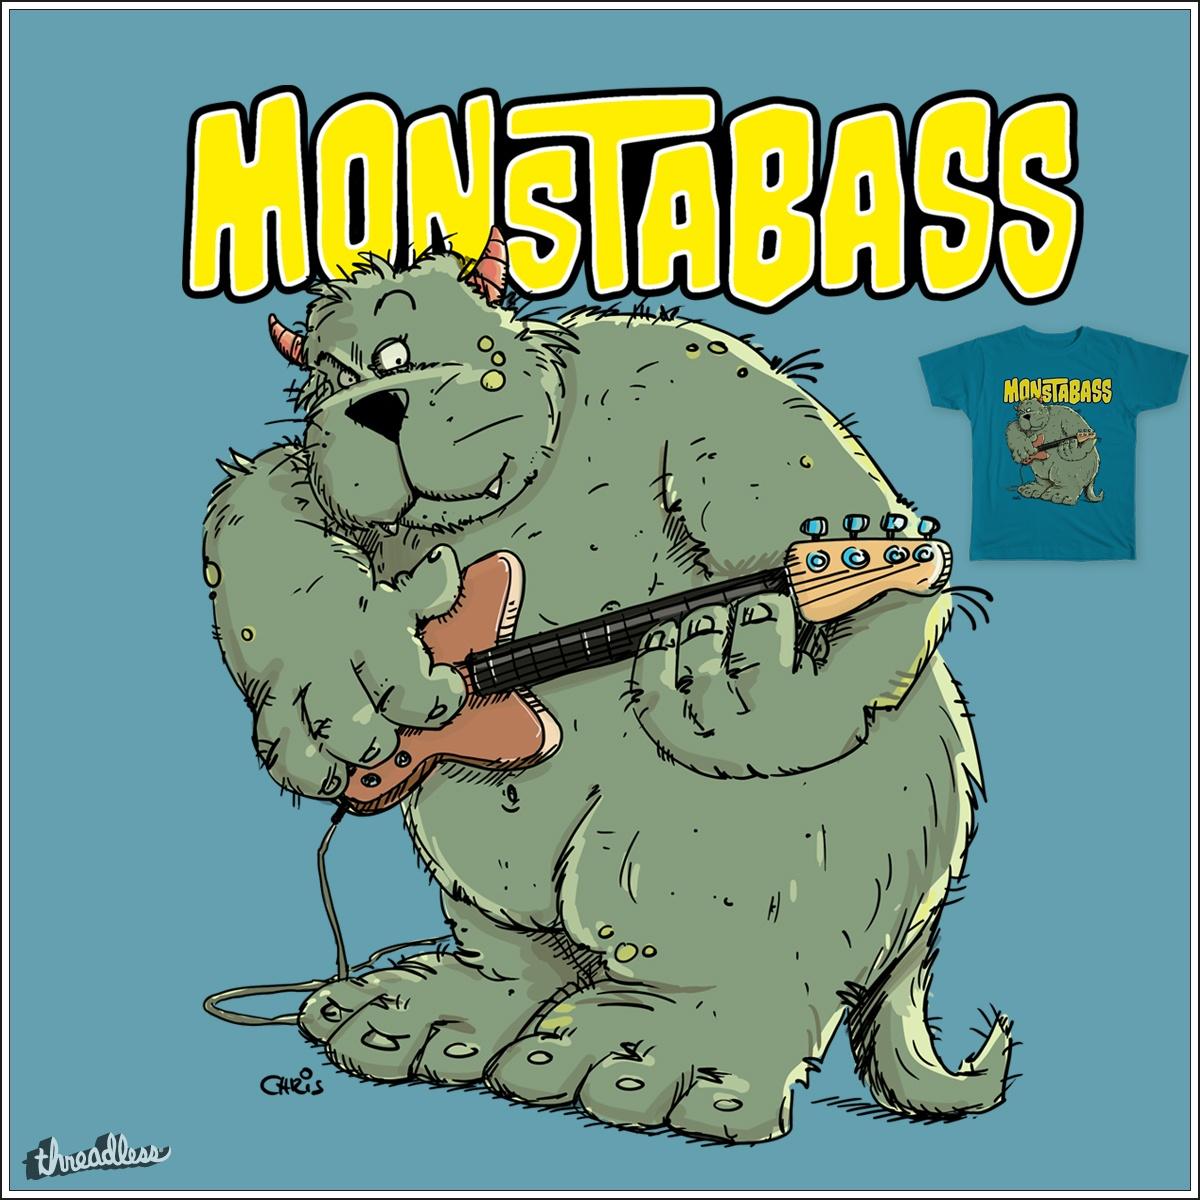 MonstaBass by chrisbears on Threadless